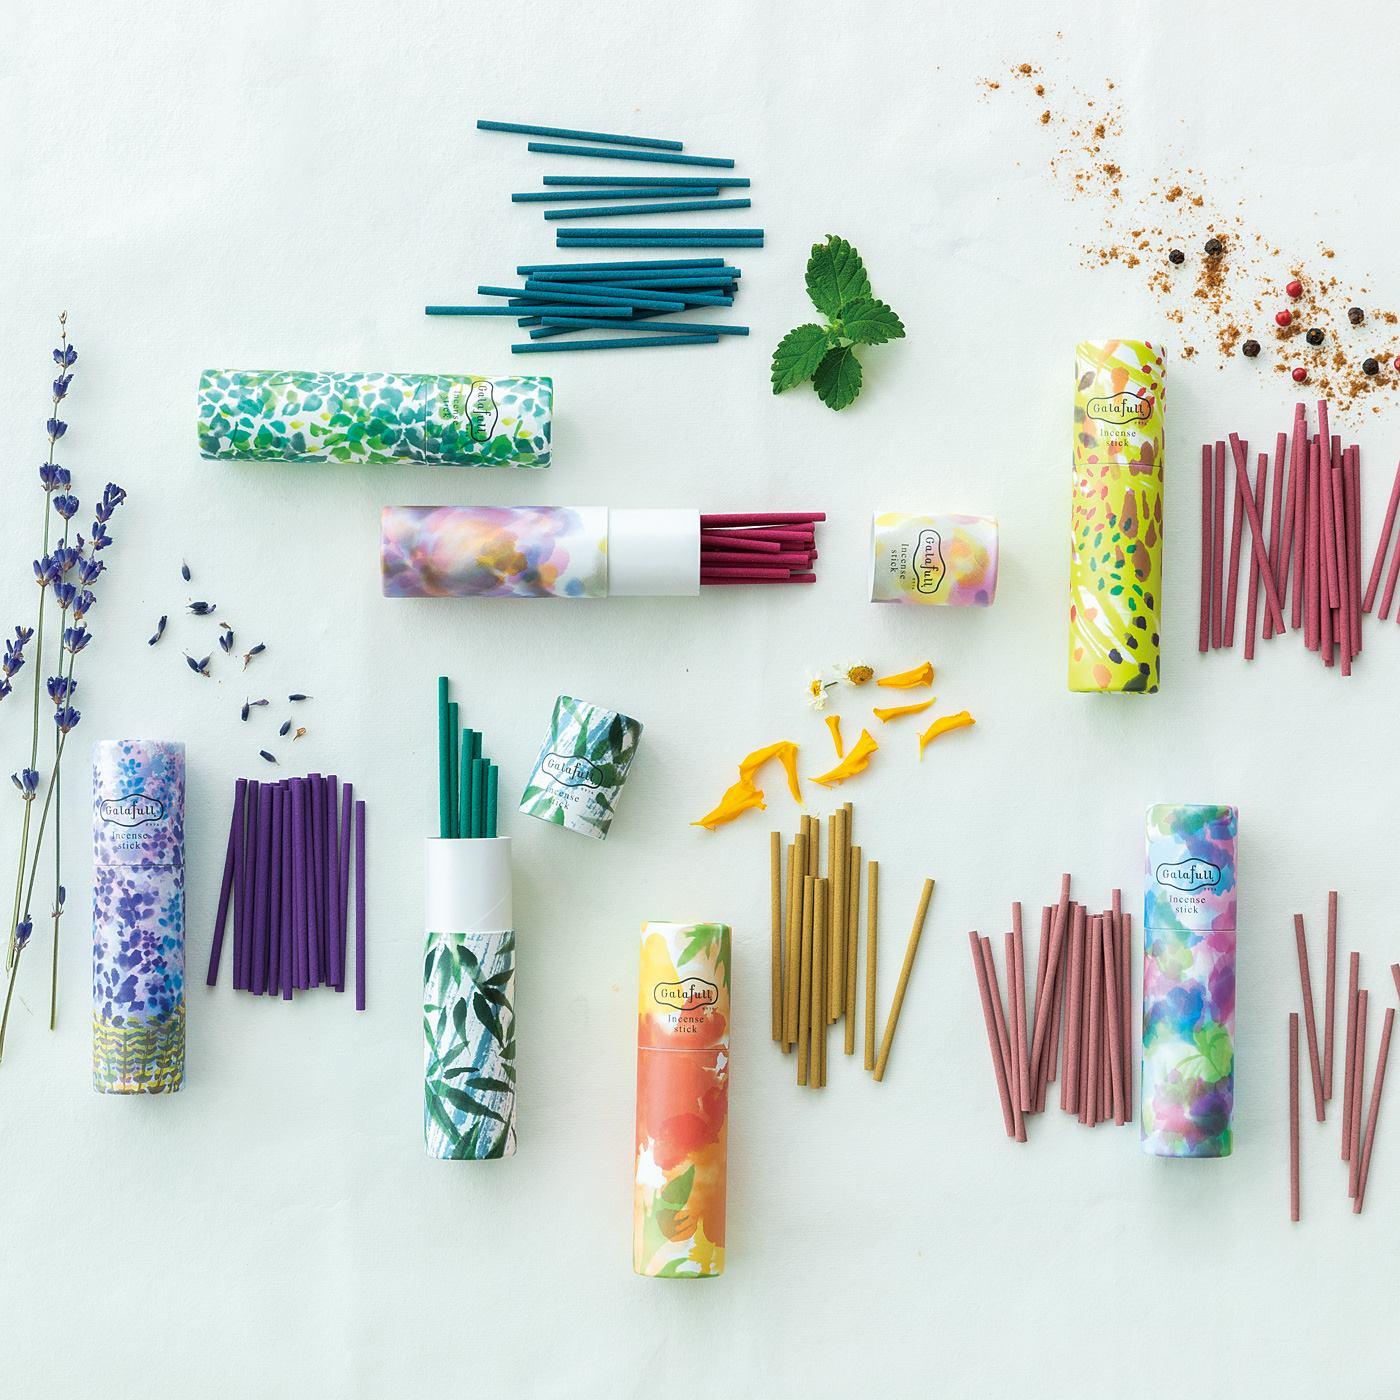 Kraso[クラソ] |ガラフル すきま時間に香り咲かせる スティック香セットの会